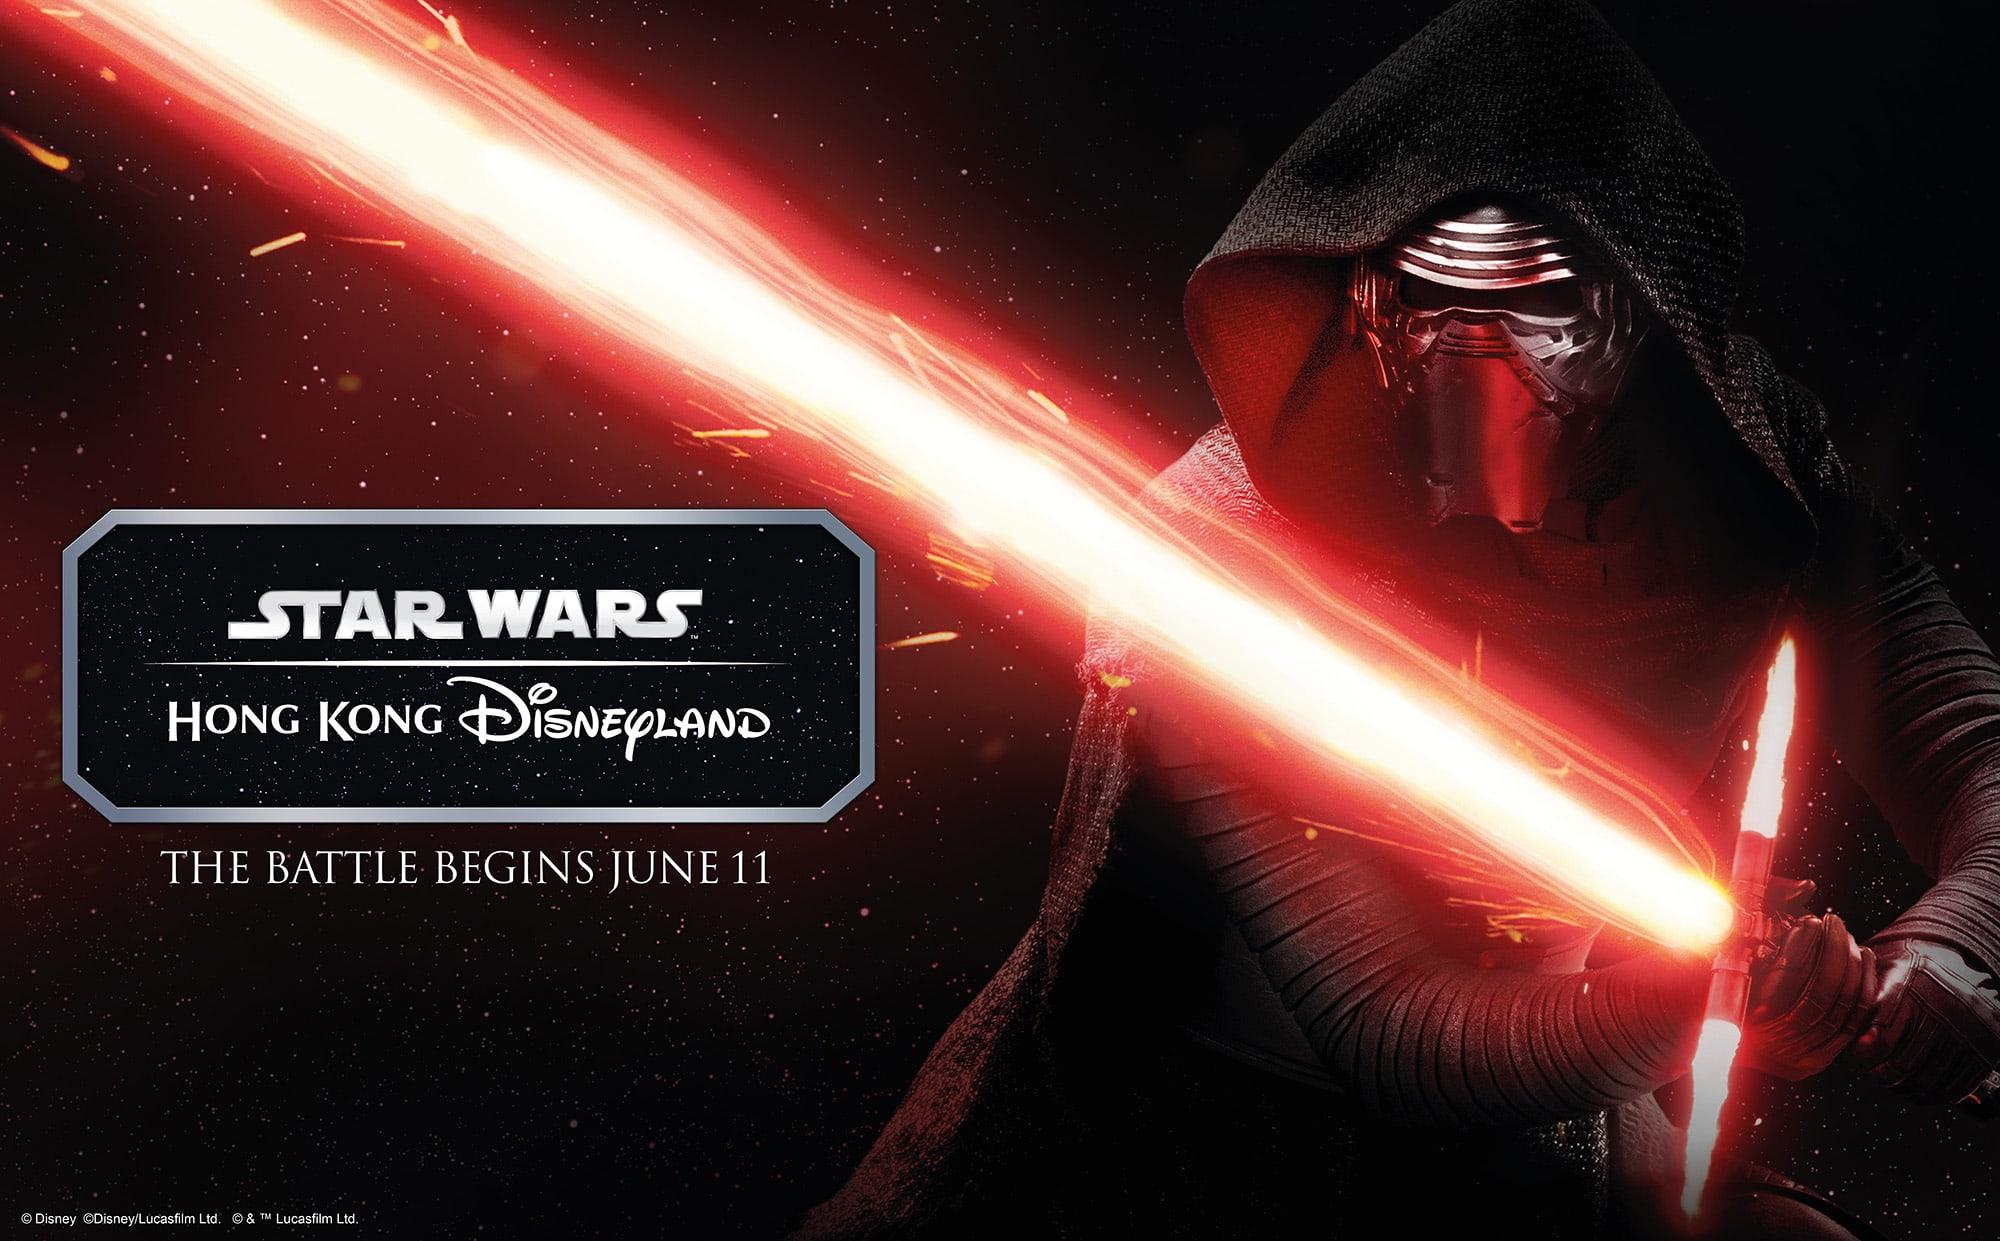 Star wars at HK Disney